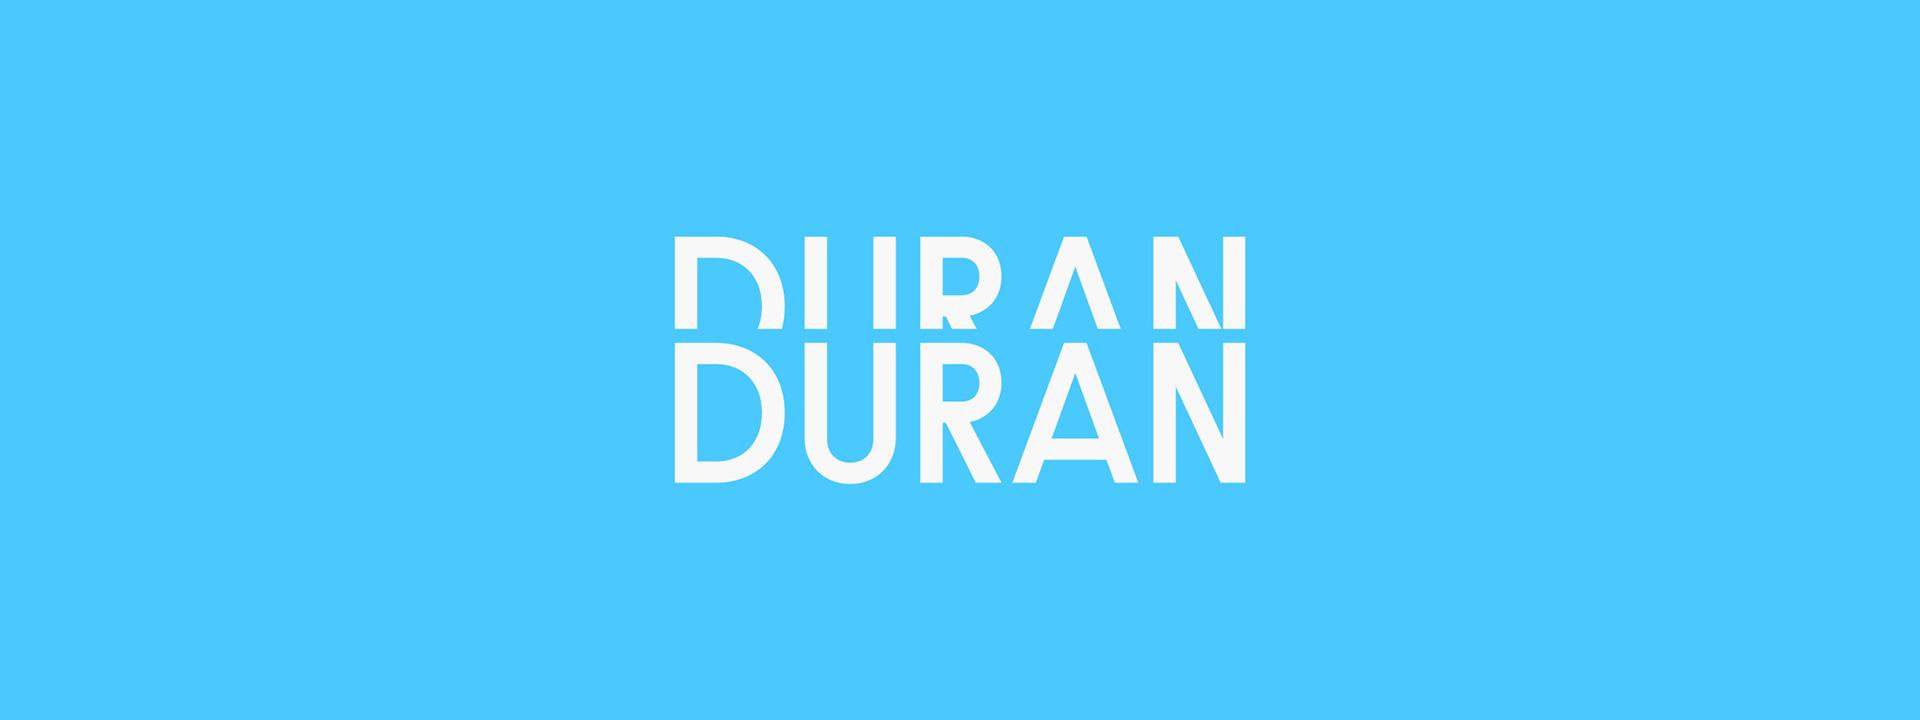 duran duran mobile app design development landing page design